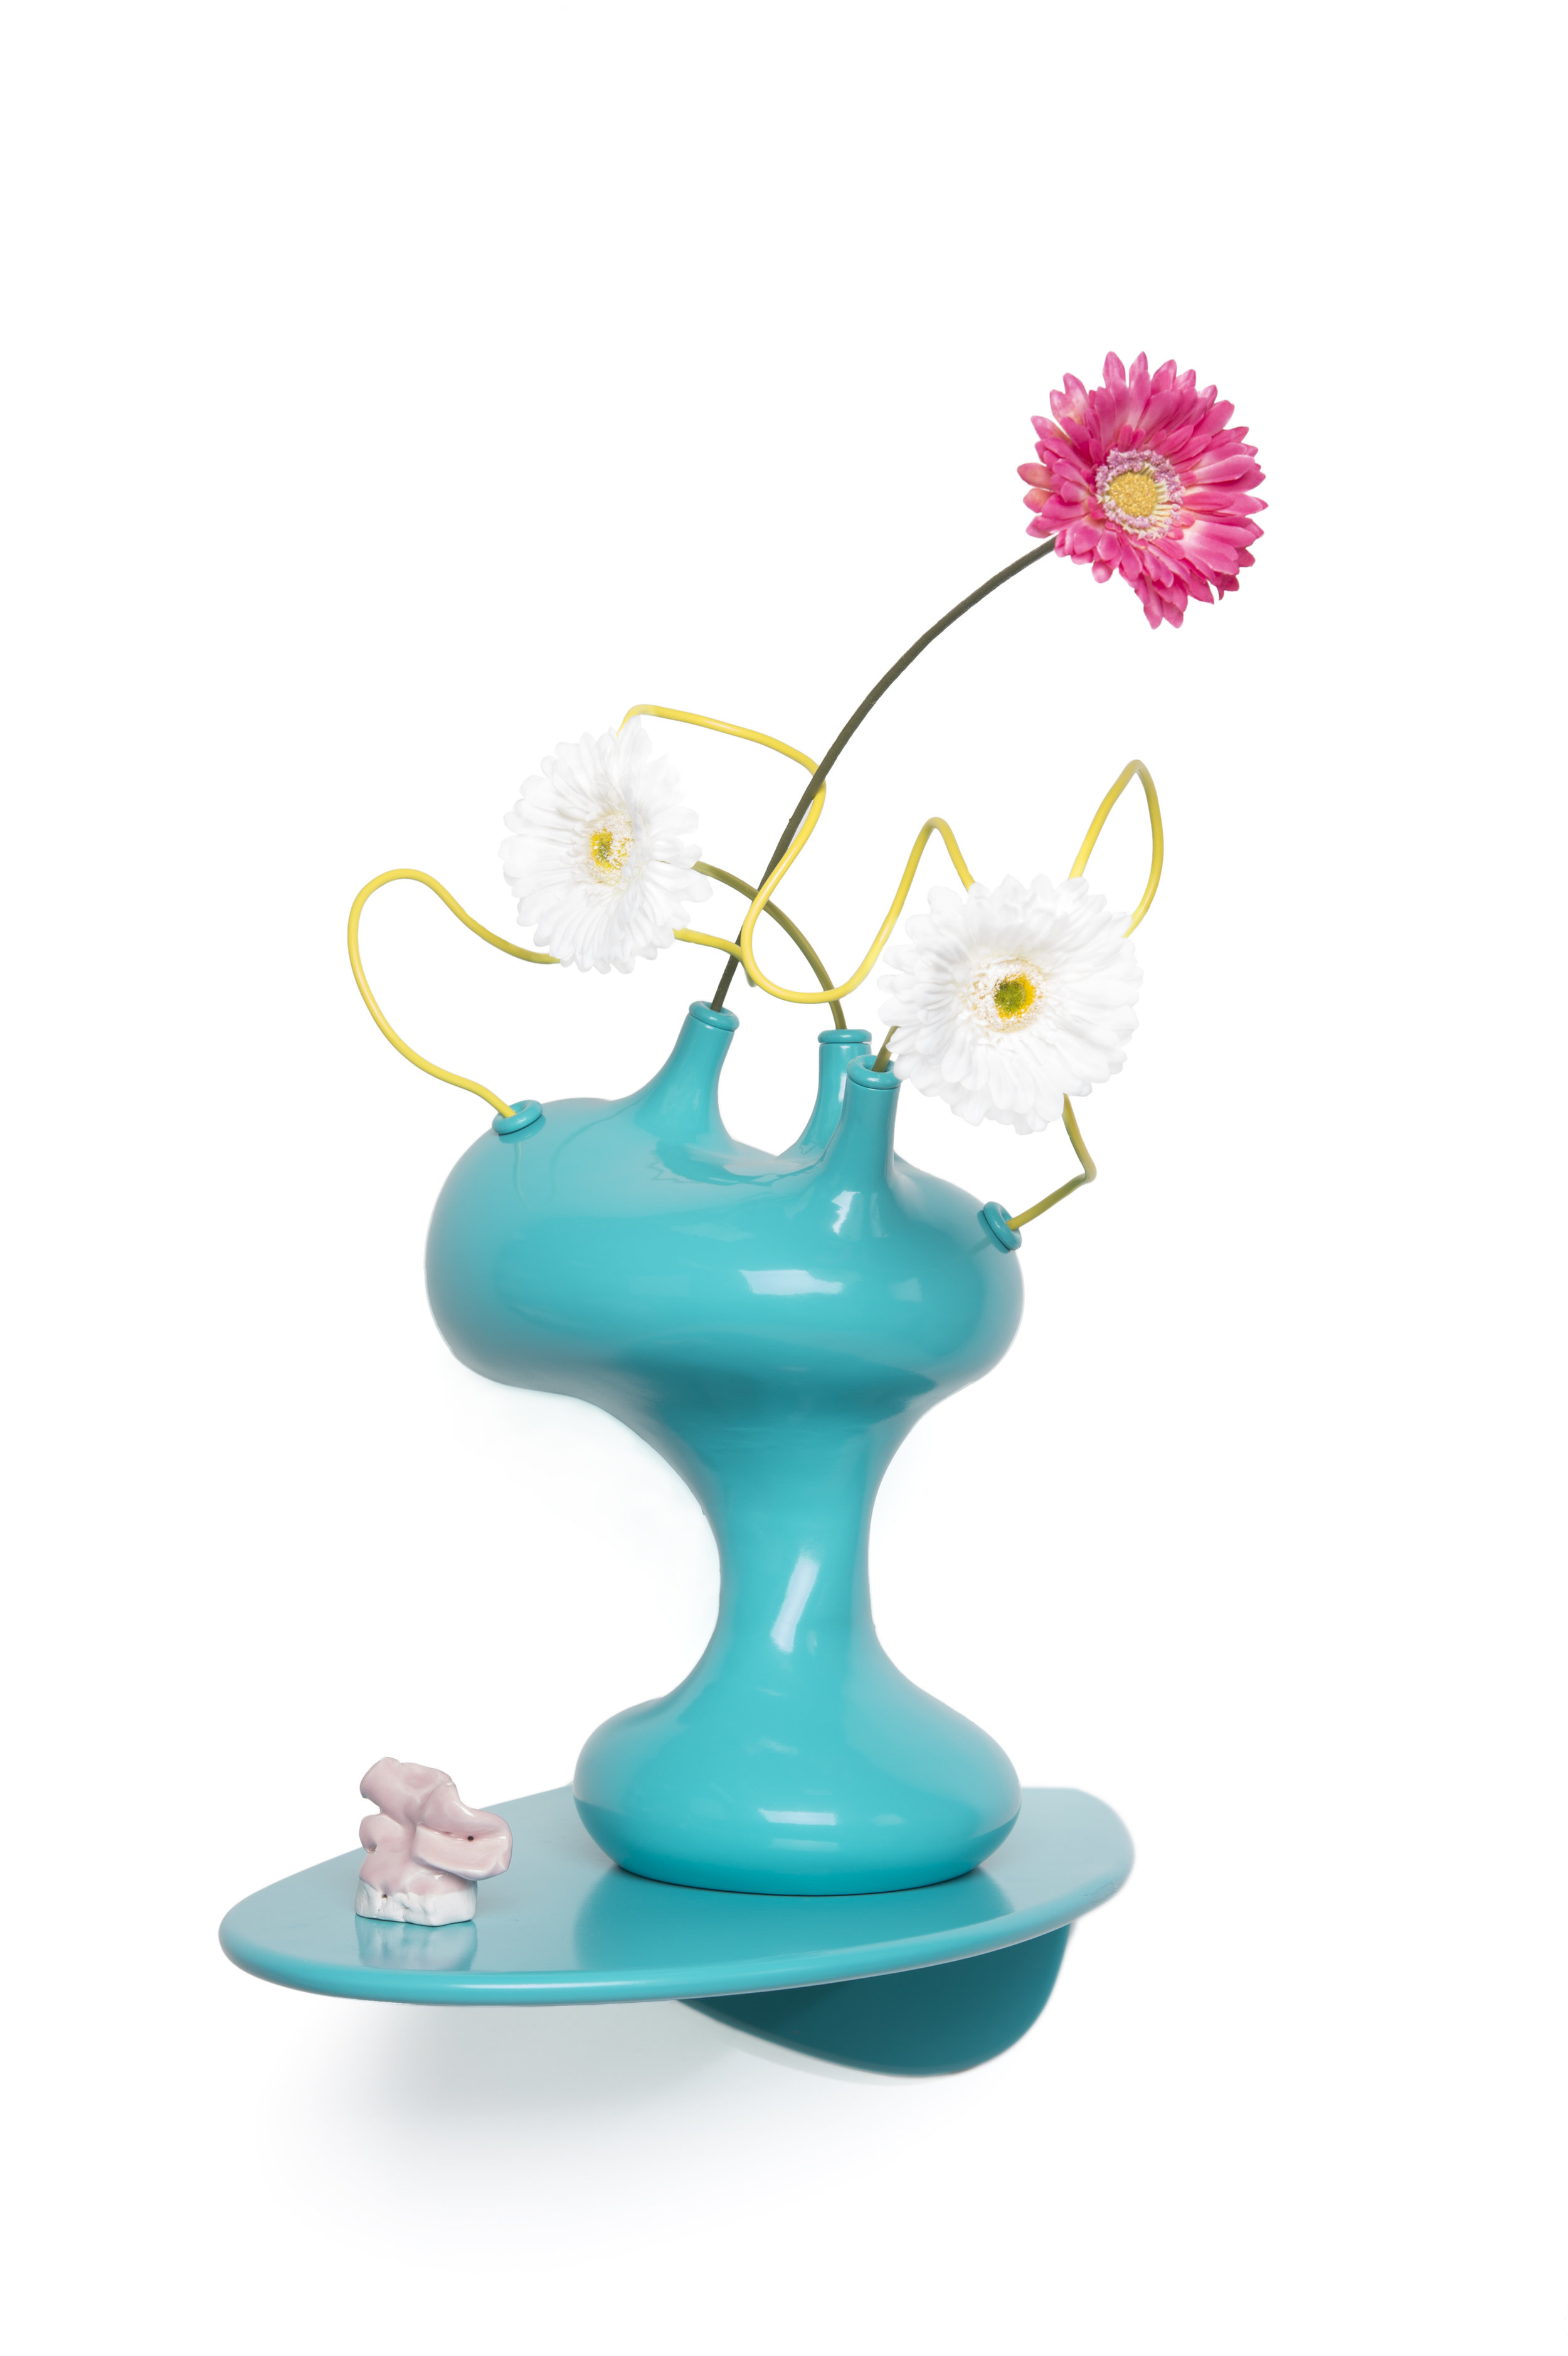 Still Life #12   Pigmented fiberglass, steel wire, porcelain flowers, wood shelf 18 x 14 x 18 inches  2013